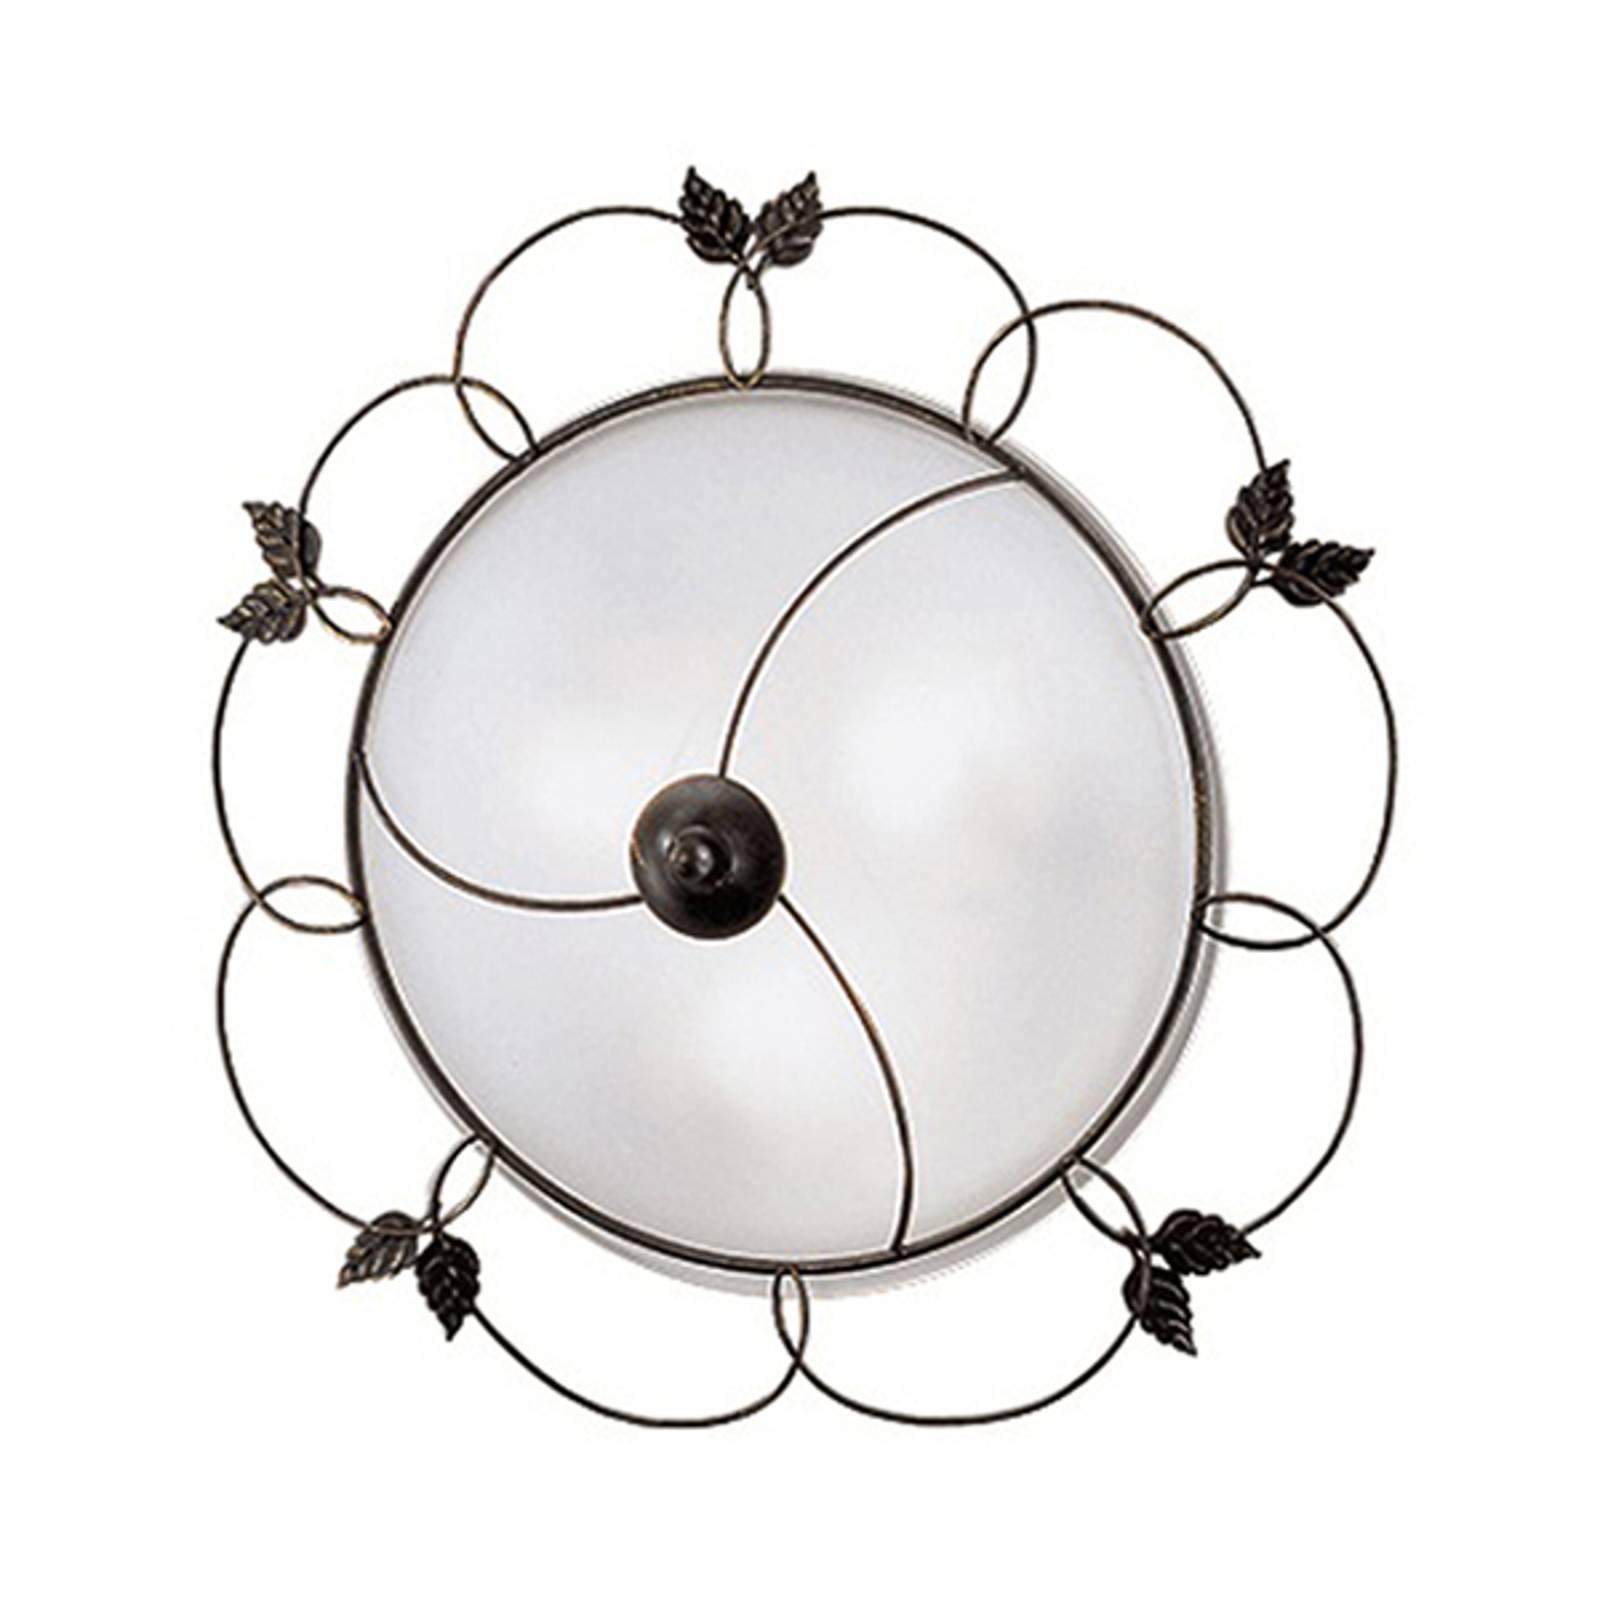 Plafondlamp FLORA by Kögl, 45 cm